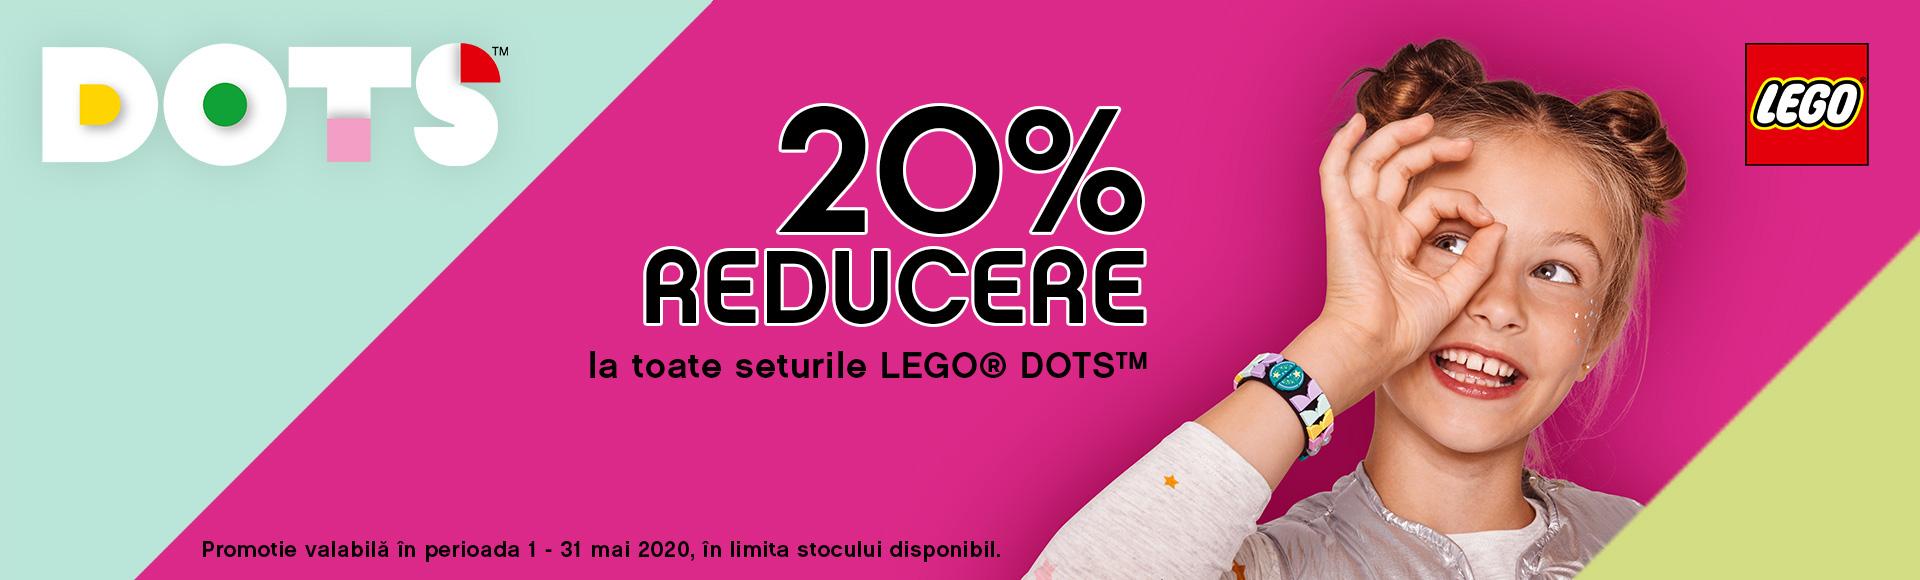 Reducere LEGO Dots